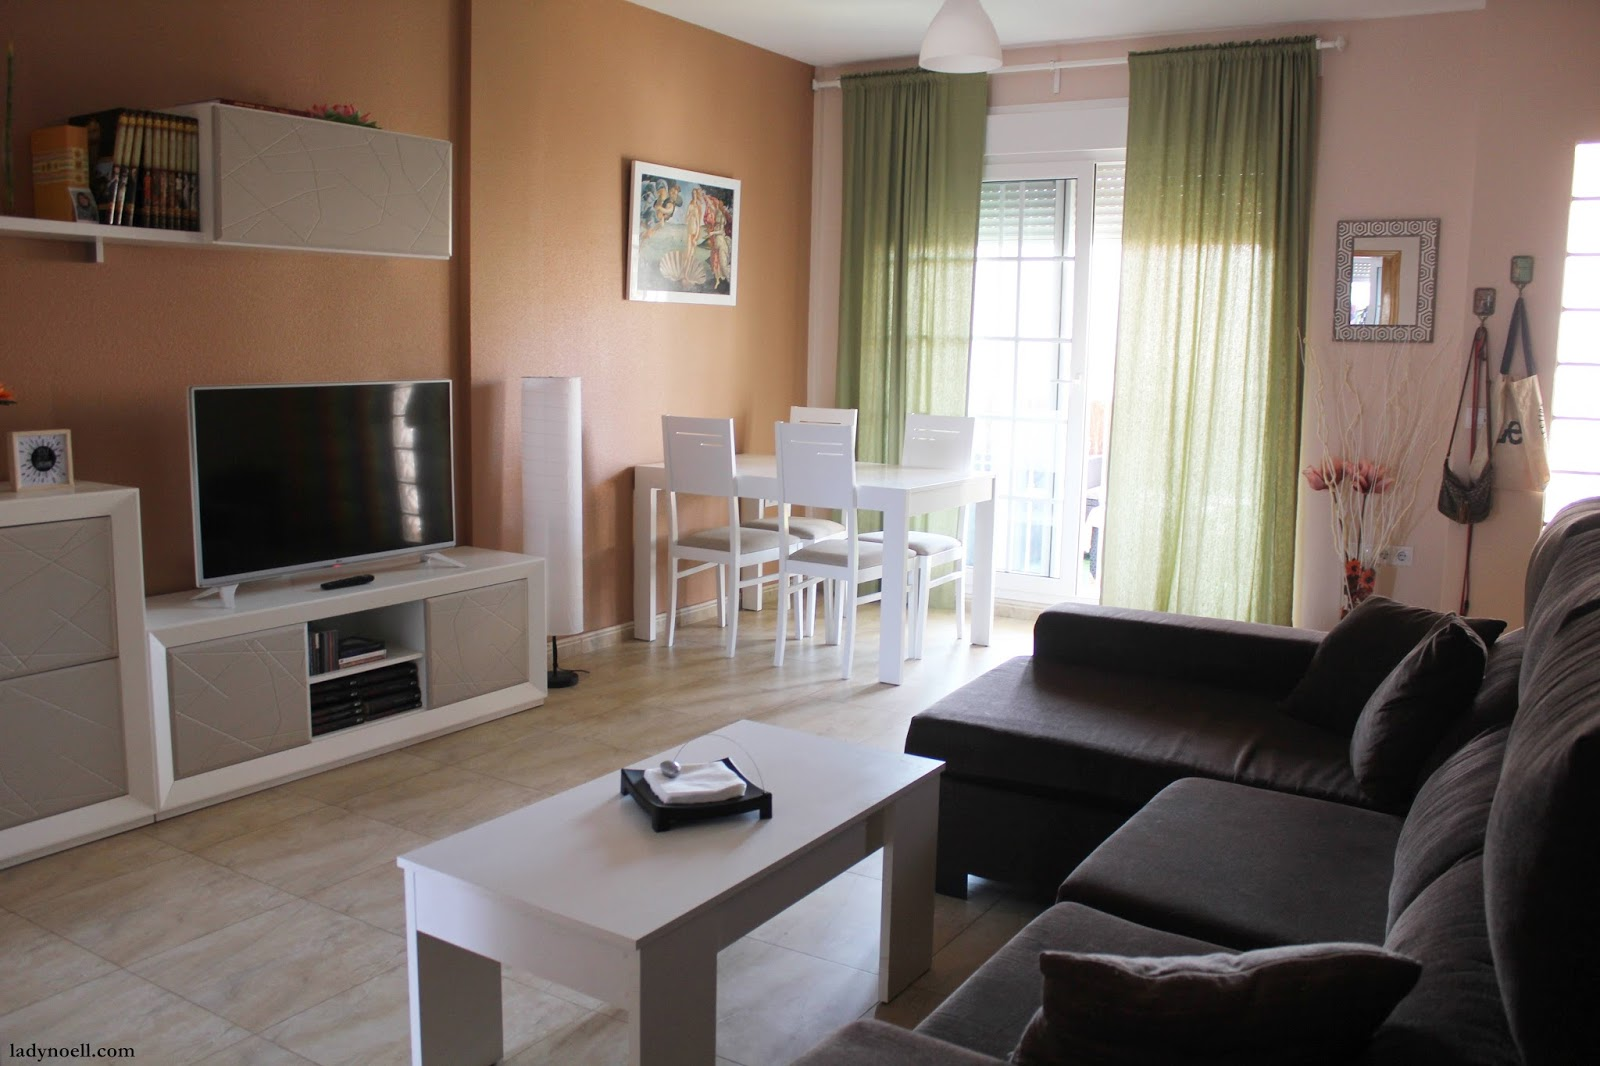 Decora tu hogar beautiful decora tu hogar con un estilo for Decora tu hogar